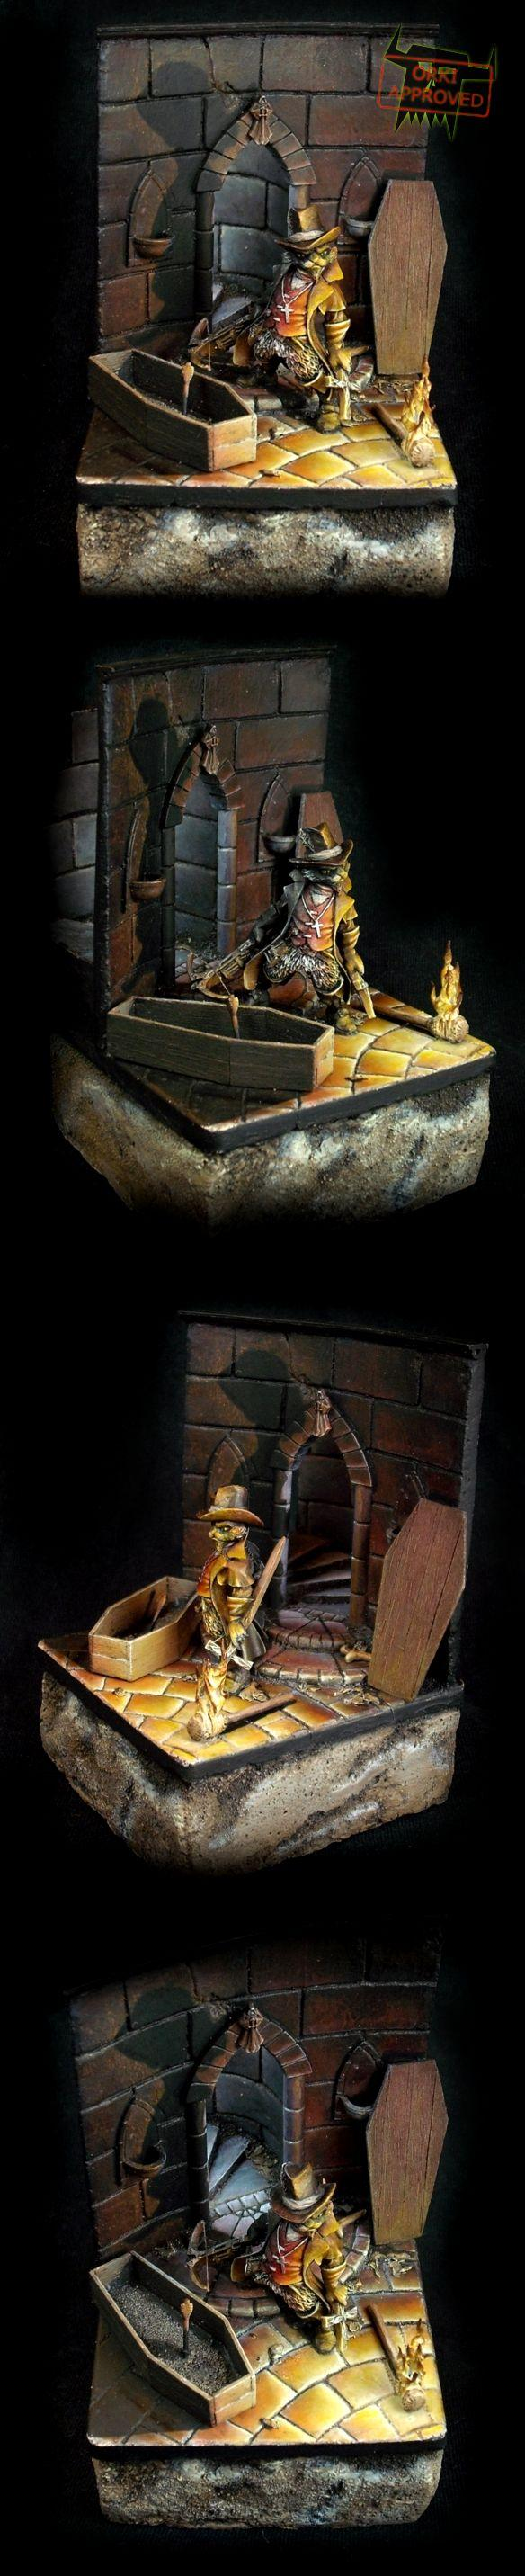 Cat Van Helsing, Coffin, Fire, Light, Moonlight, Object Source Lighting, Shadow, Tale Of War, Tomb, Vampire Hunter